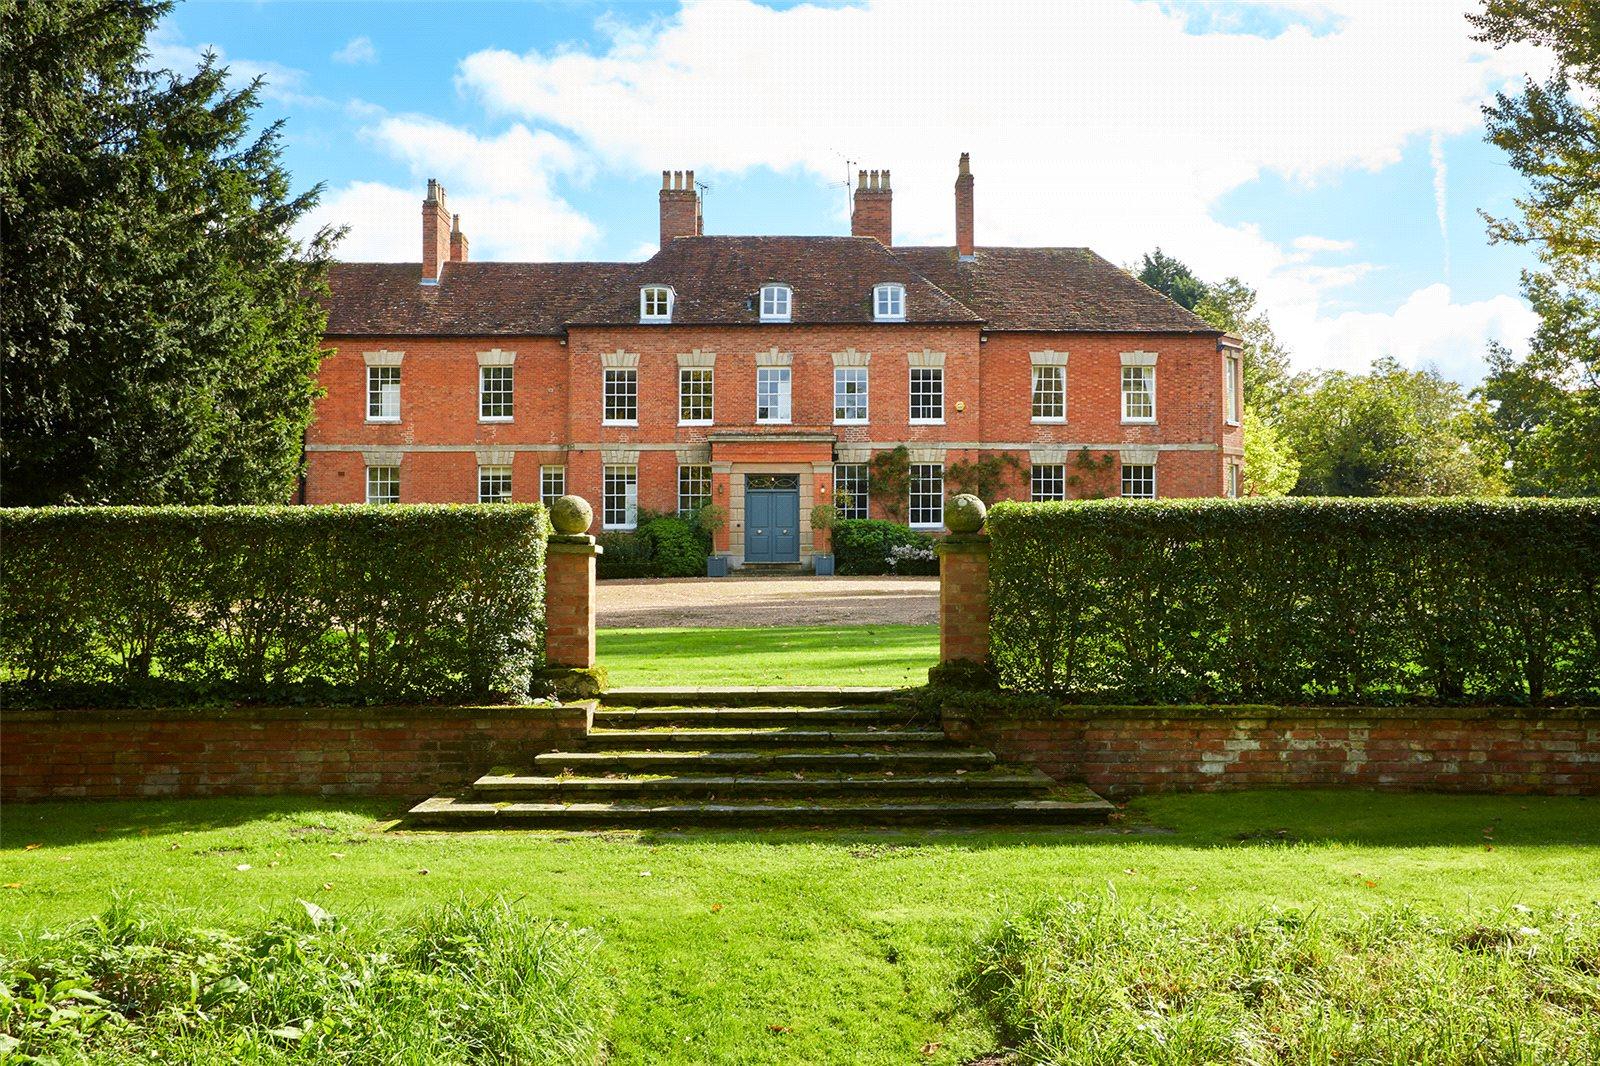 Single Family Home for Sale at Eathorpe, Leamington Spa, Warwickshire, CV33 Leamington Spa, England